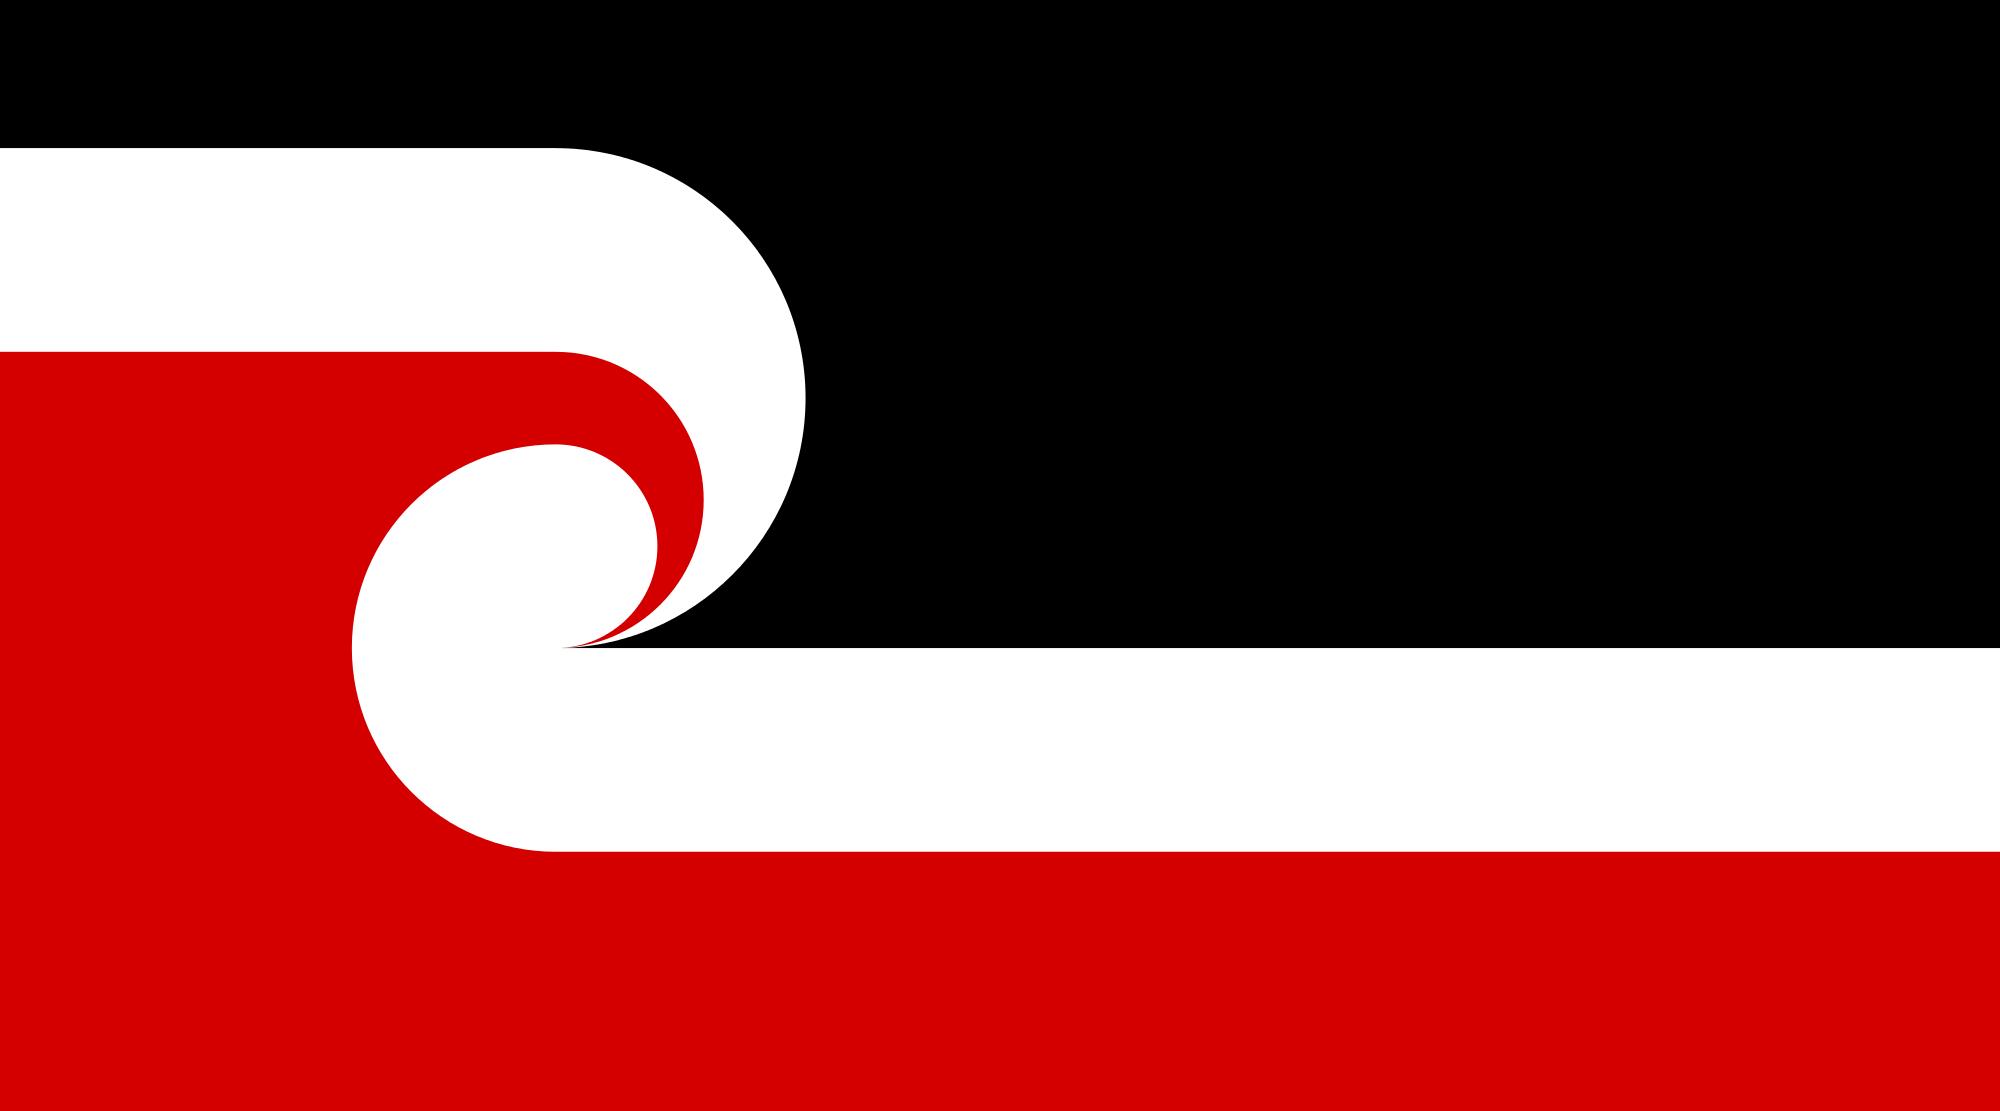 Le drapeau représentant les communautés Maori, le  Tino rangatiratanga